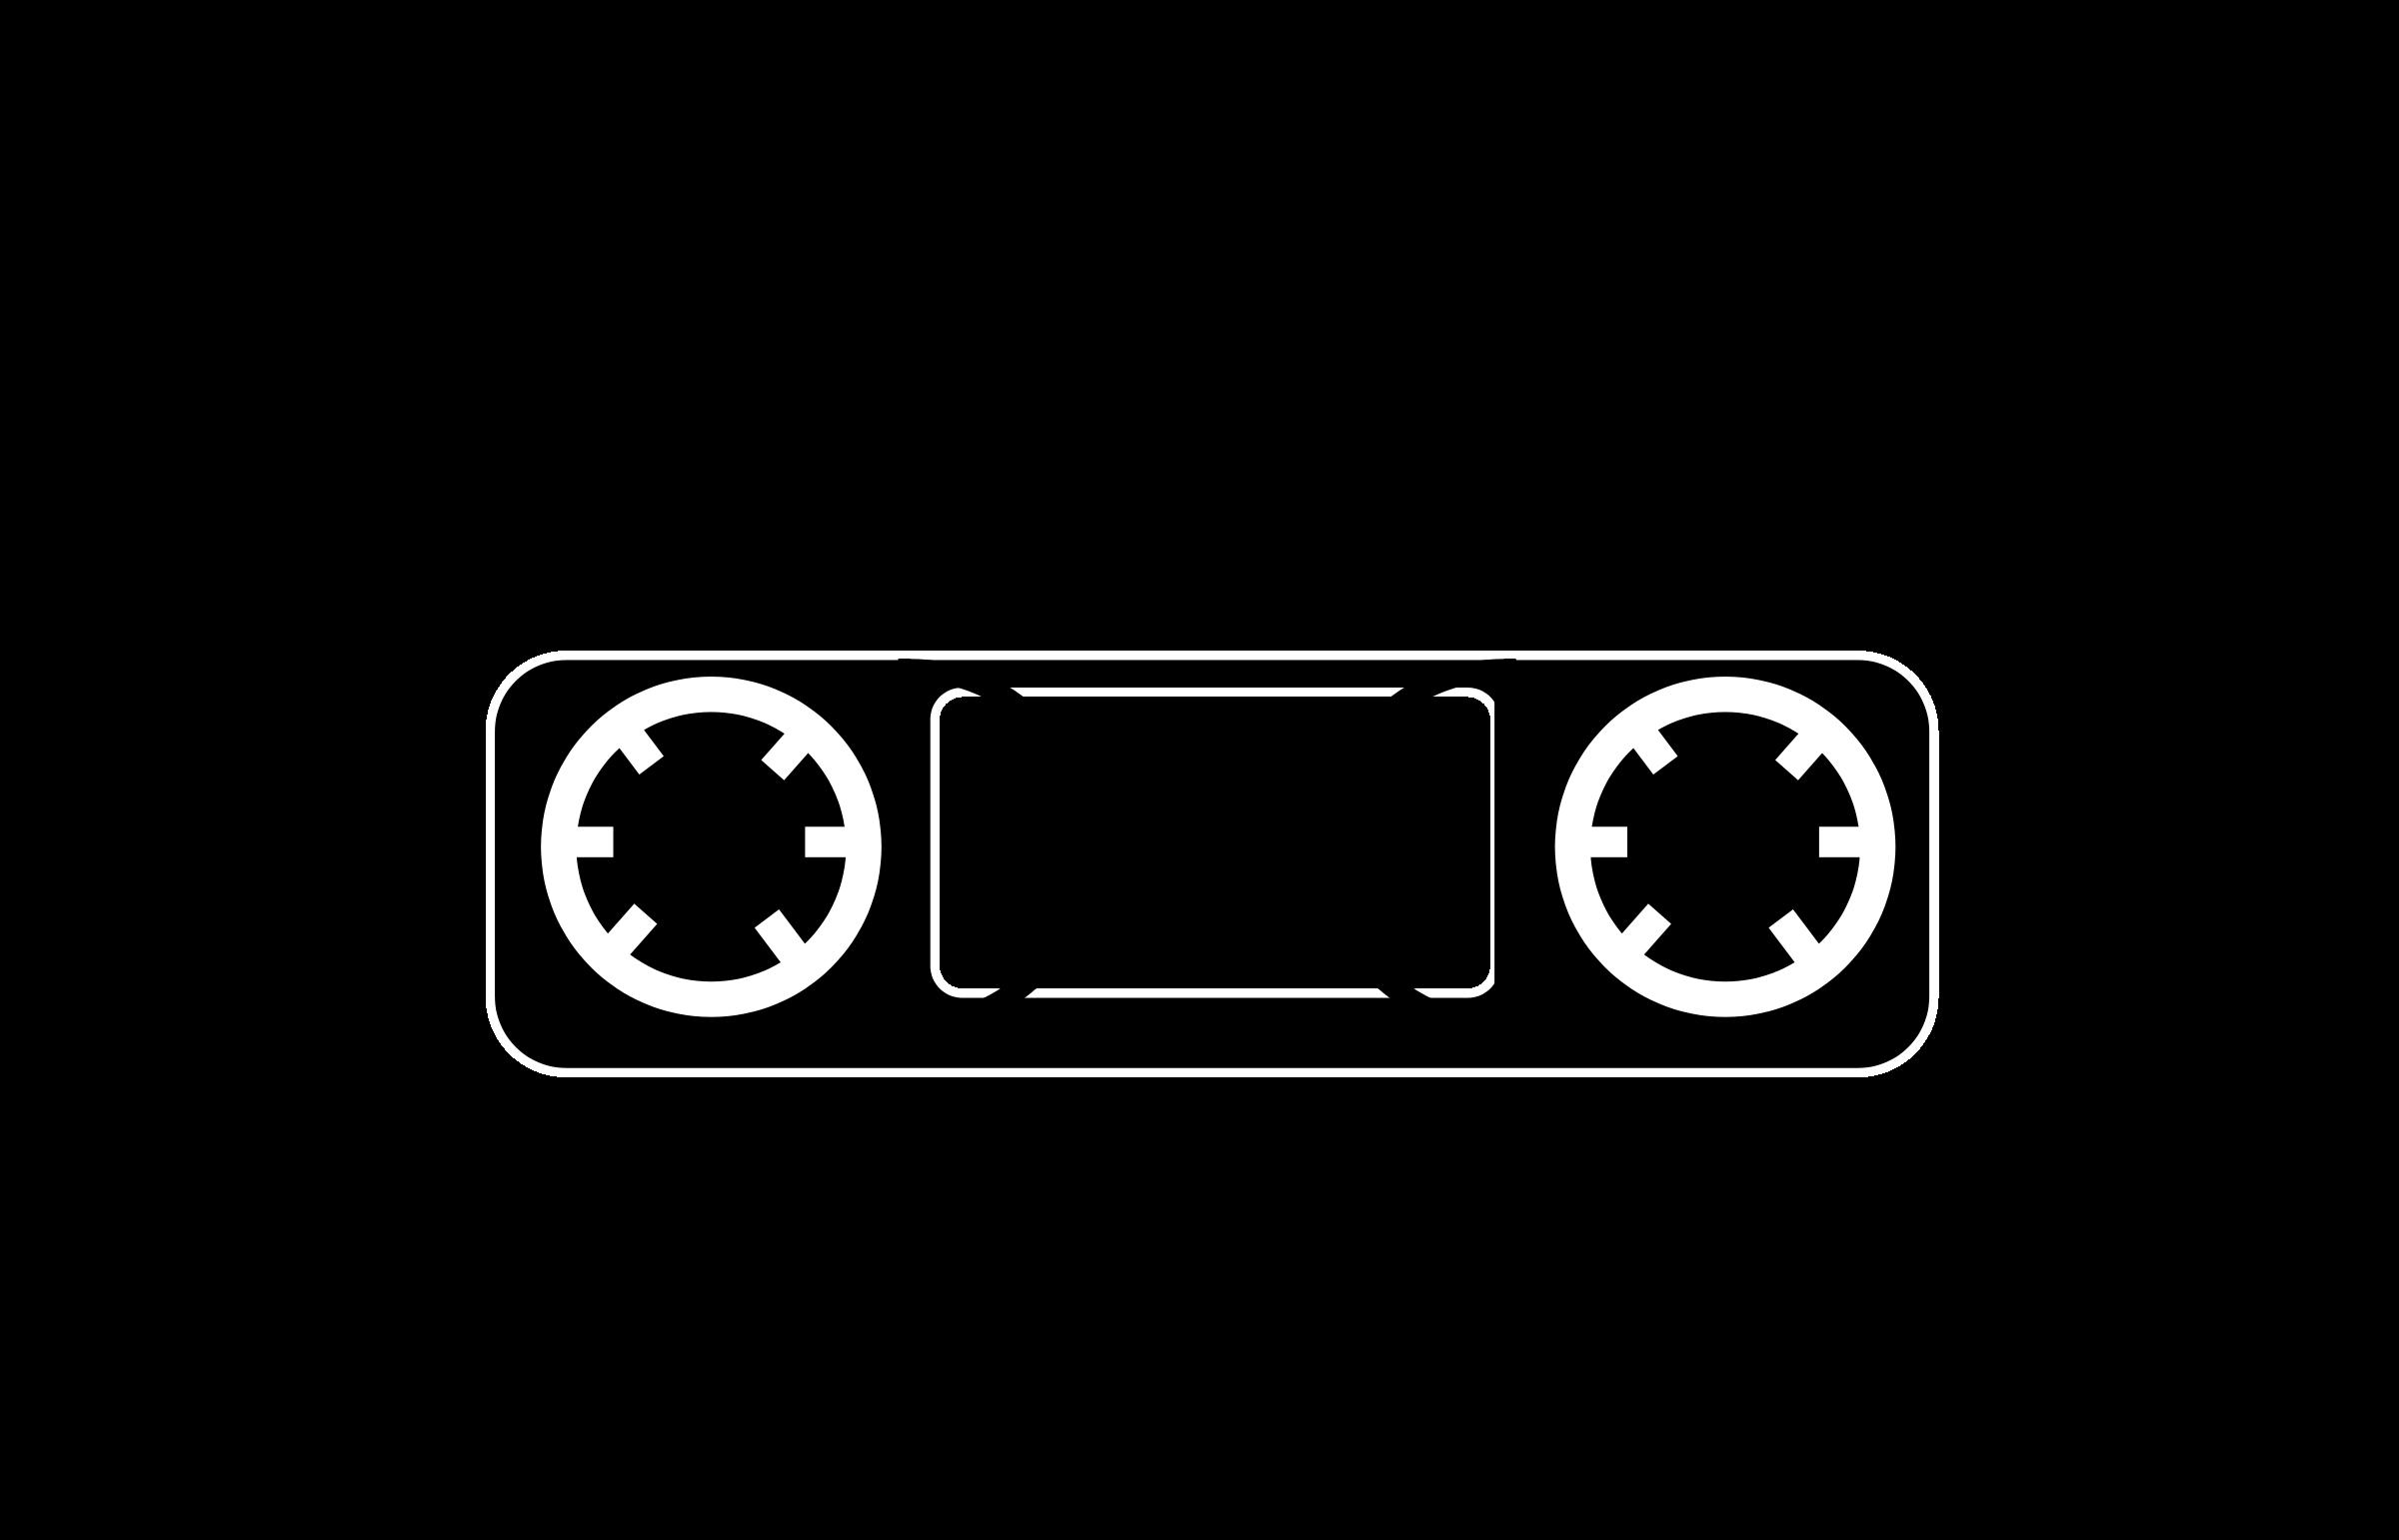 Clipart - Tape Cassette .-Clipart - tape cassette .-9